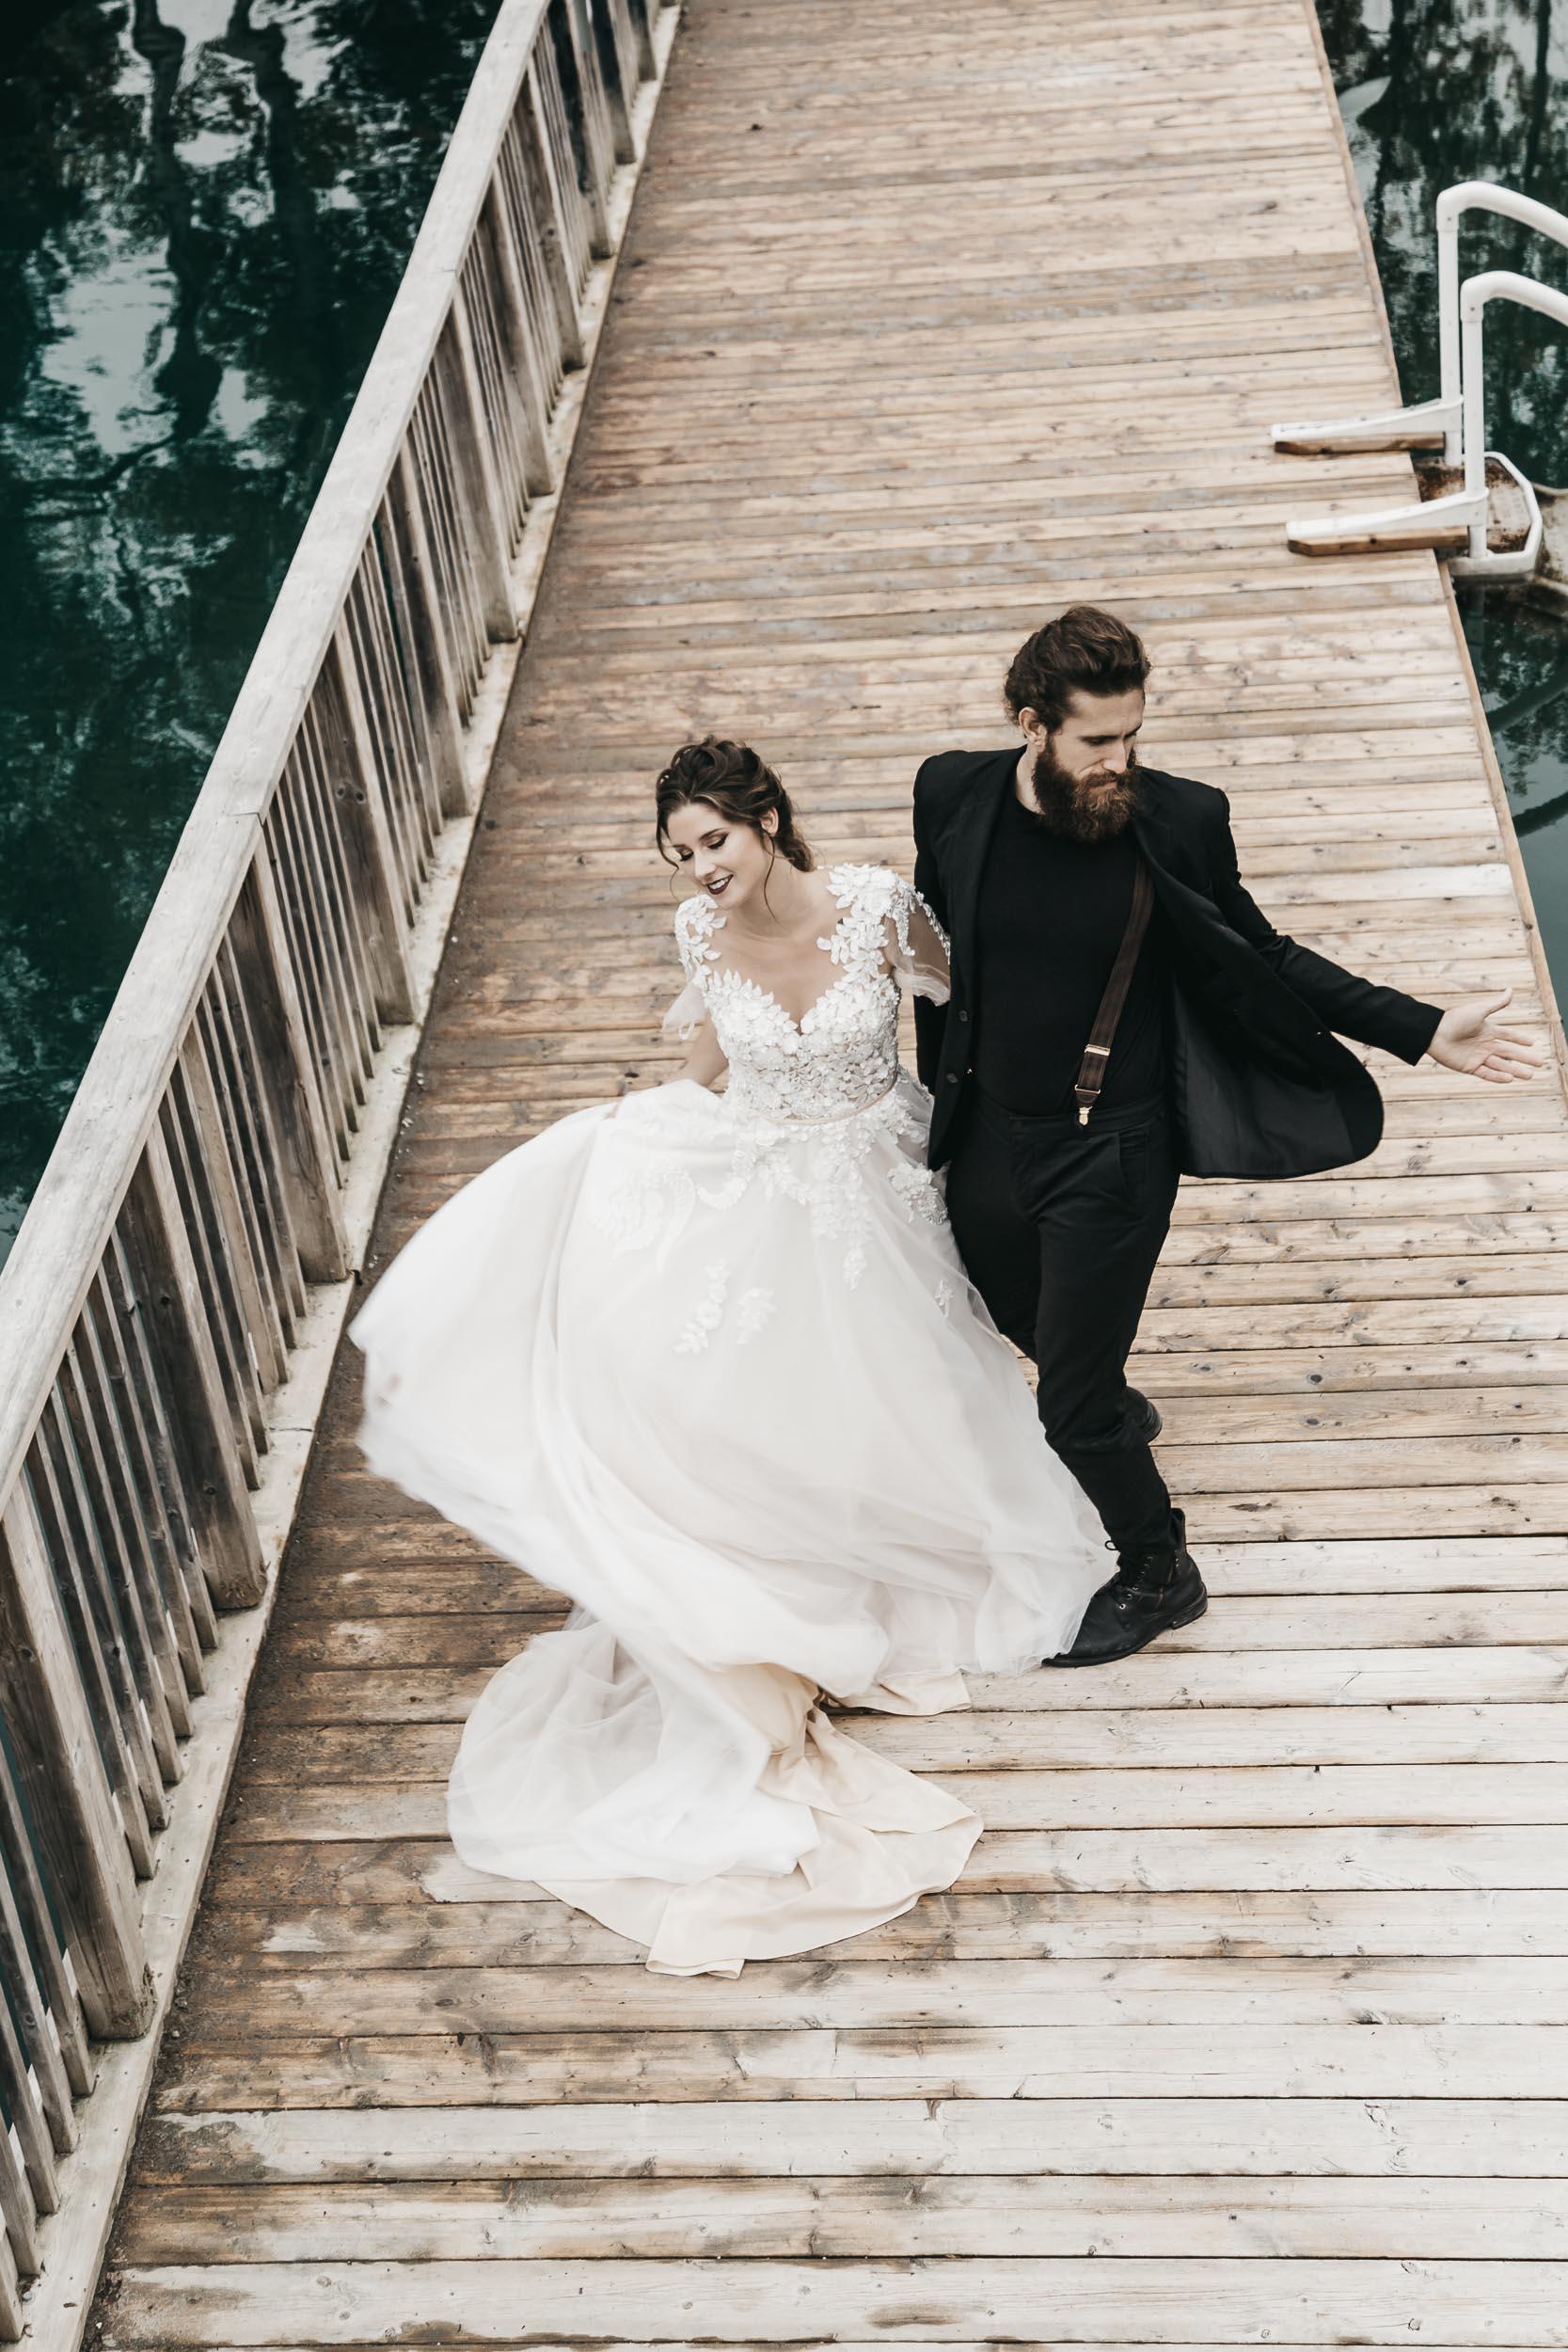 intimate-wedding-elopement-photographer-ottawa-toronto-0040.jpg